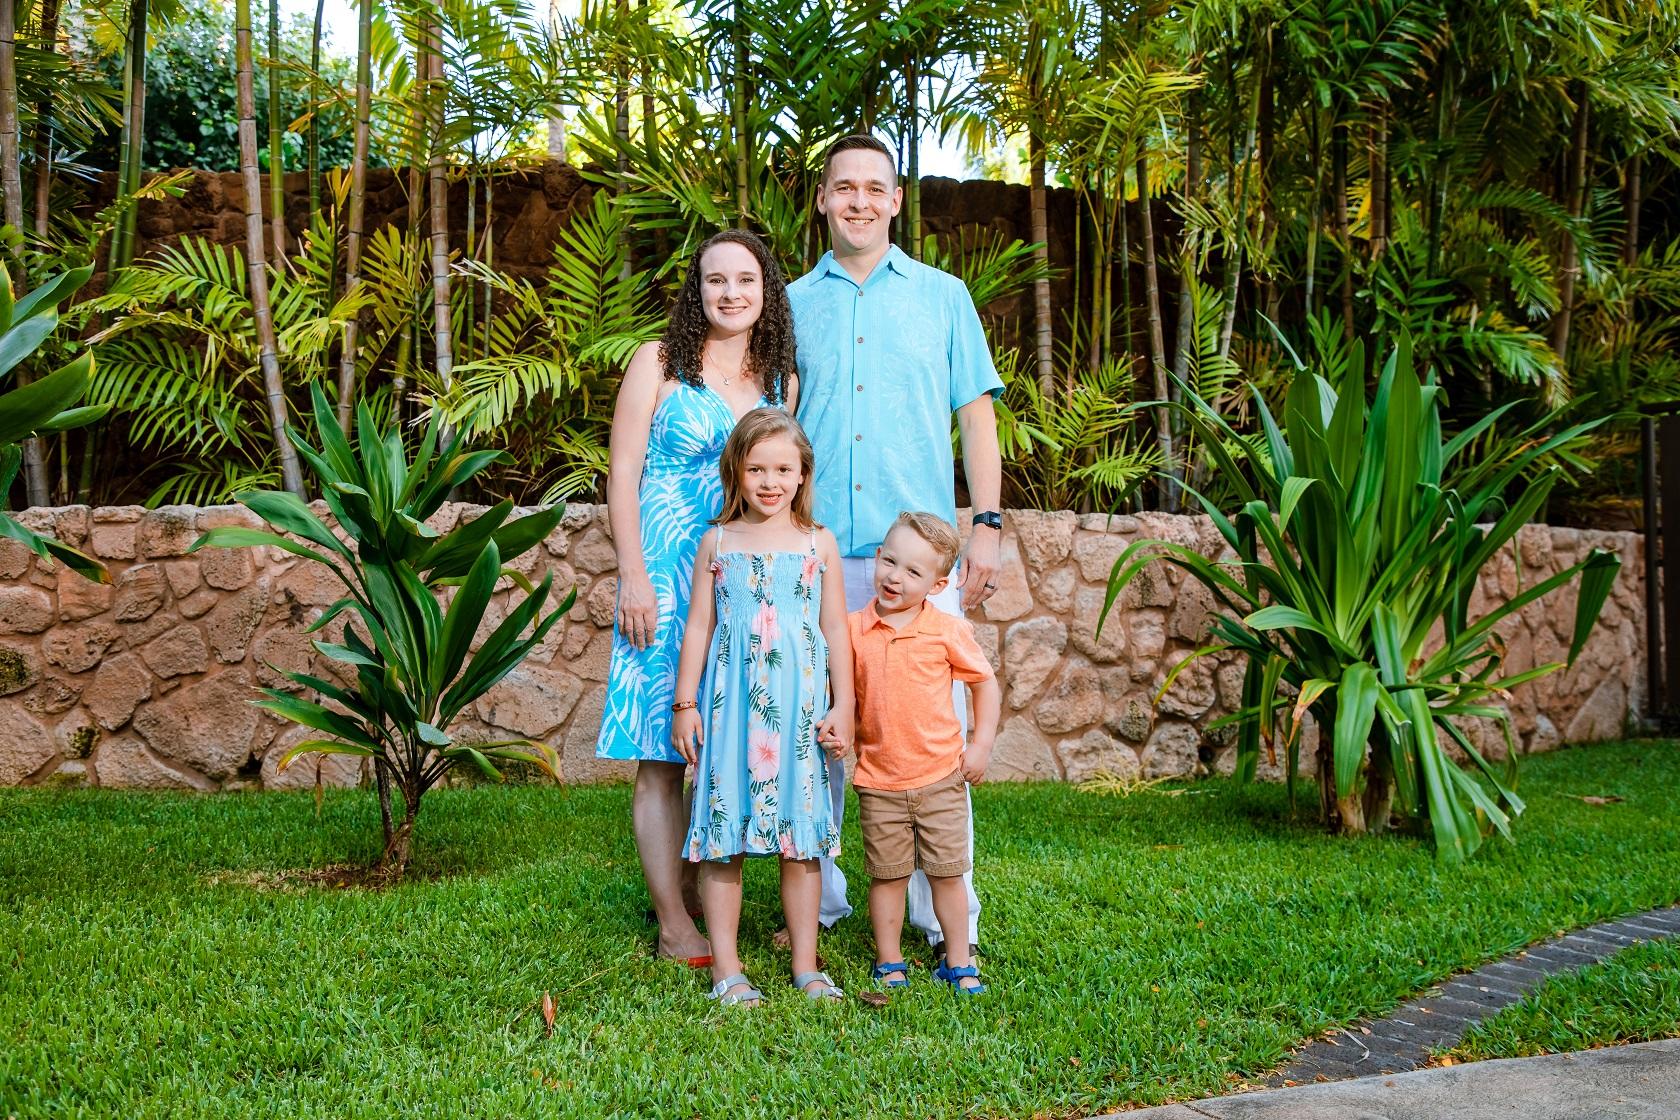 Oahu2018-48327.jpg